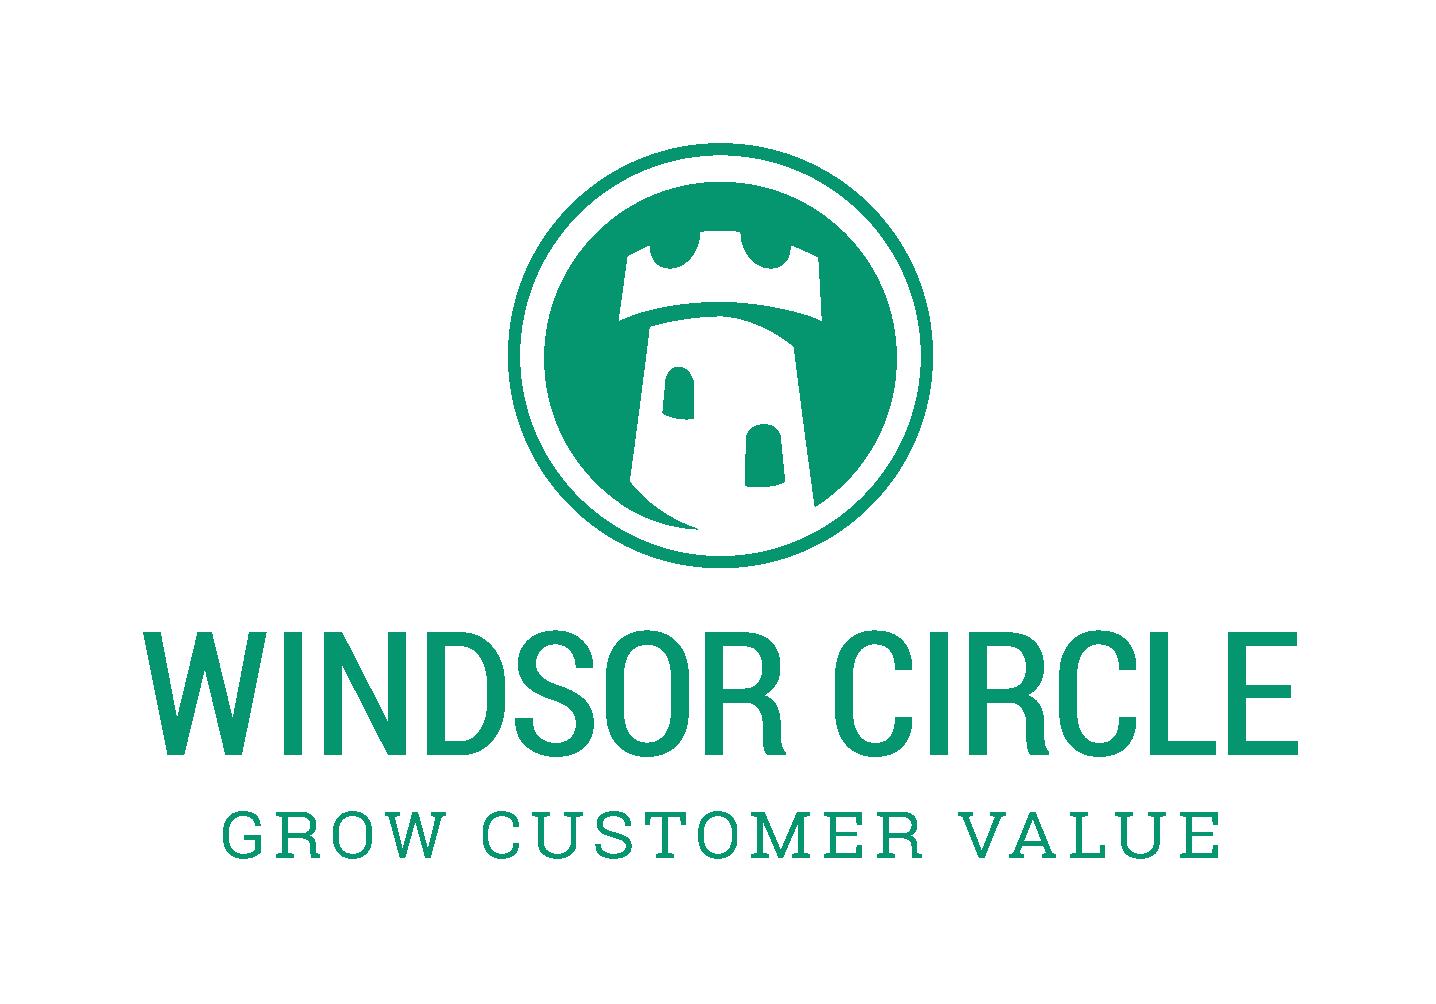 WC_logo_vertTag_green_trans.png